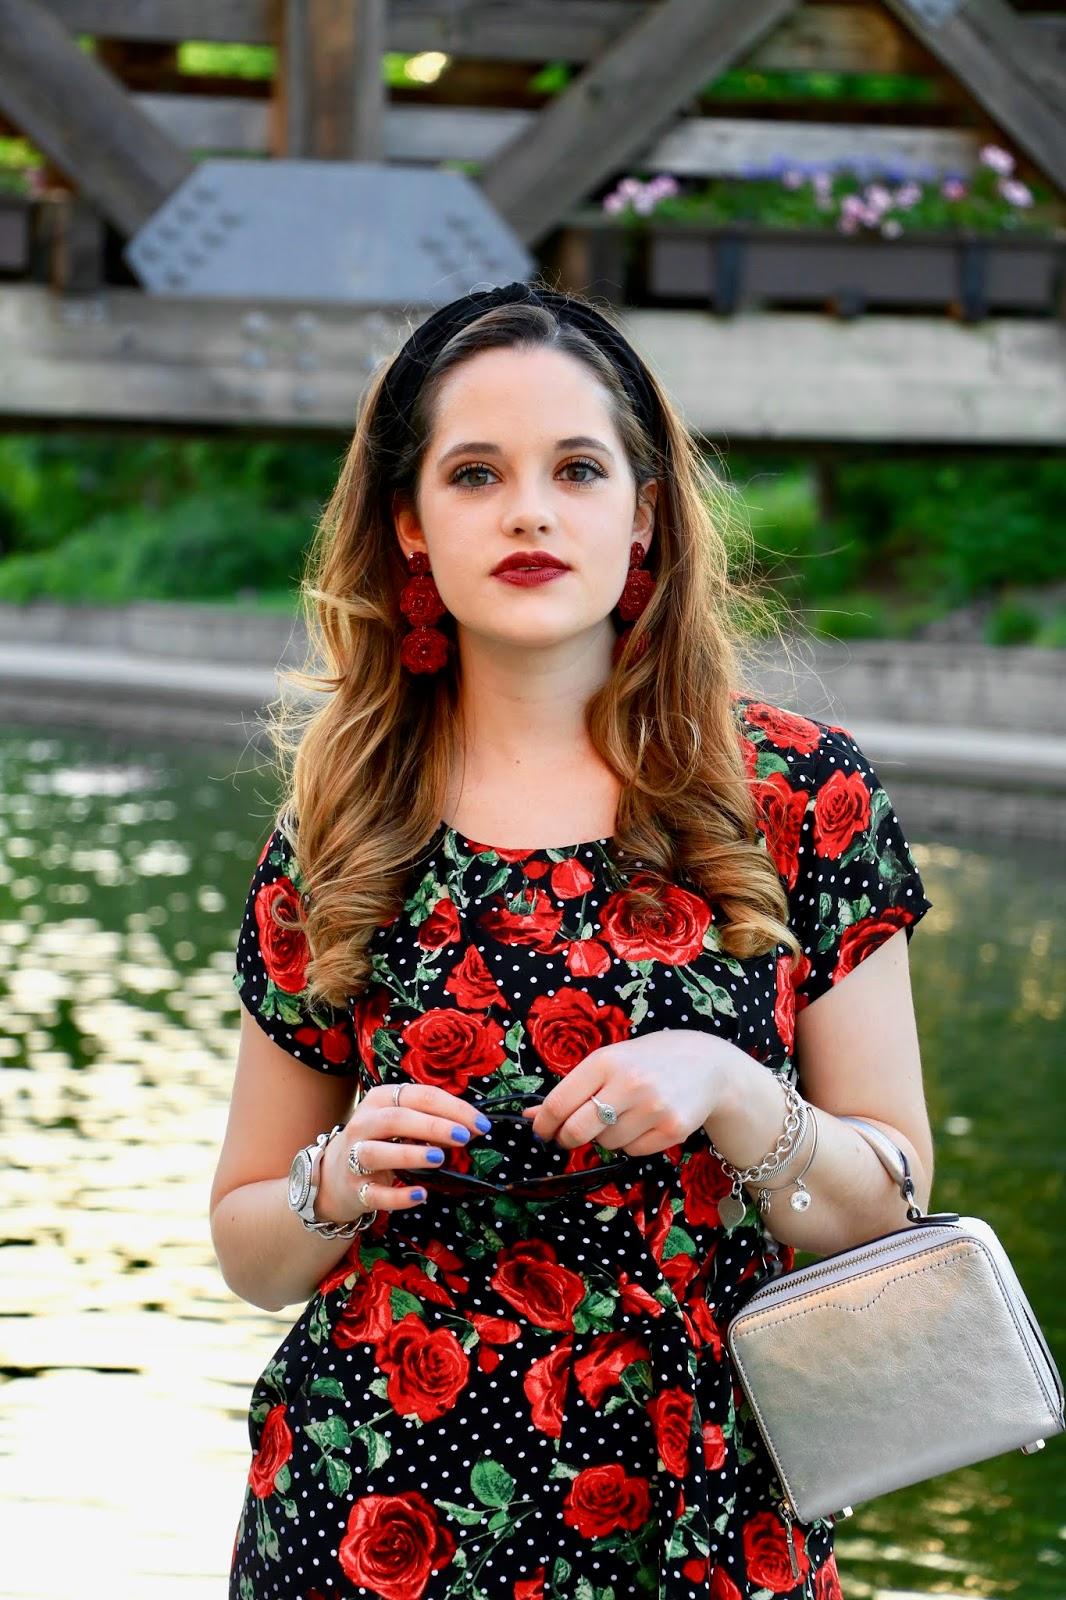 Nyc fashion blogger Kathleen Harper's summer fashion